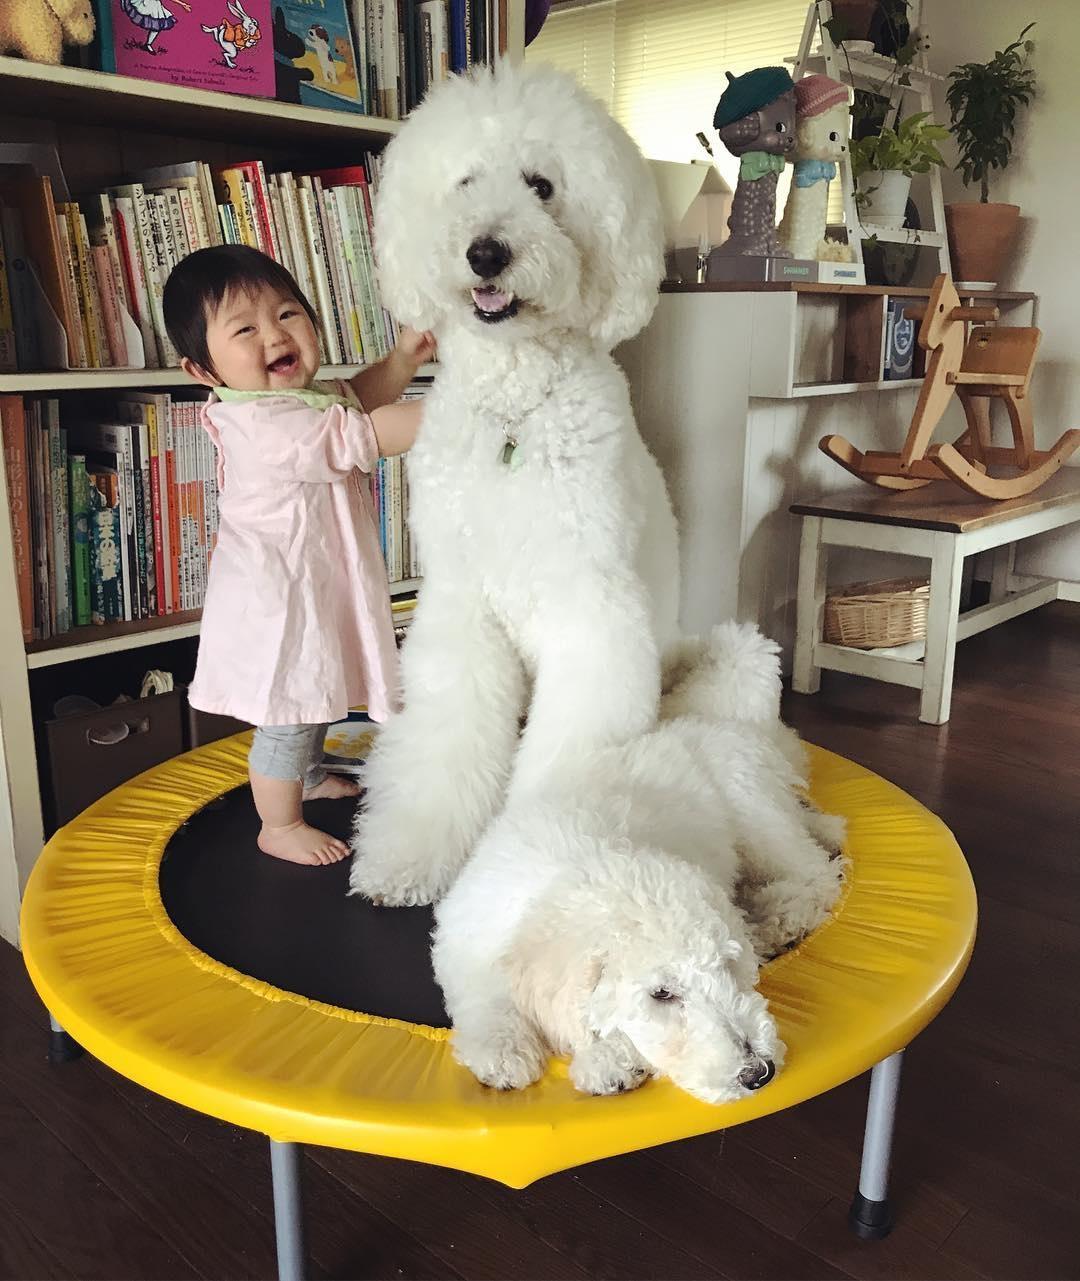 co be 2 tuoi bong noi tieng khap mang xa hoi nho loat anh cung cho poodle sieu de thuong